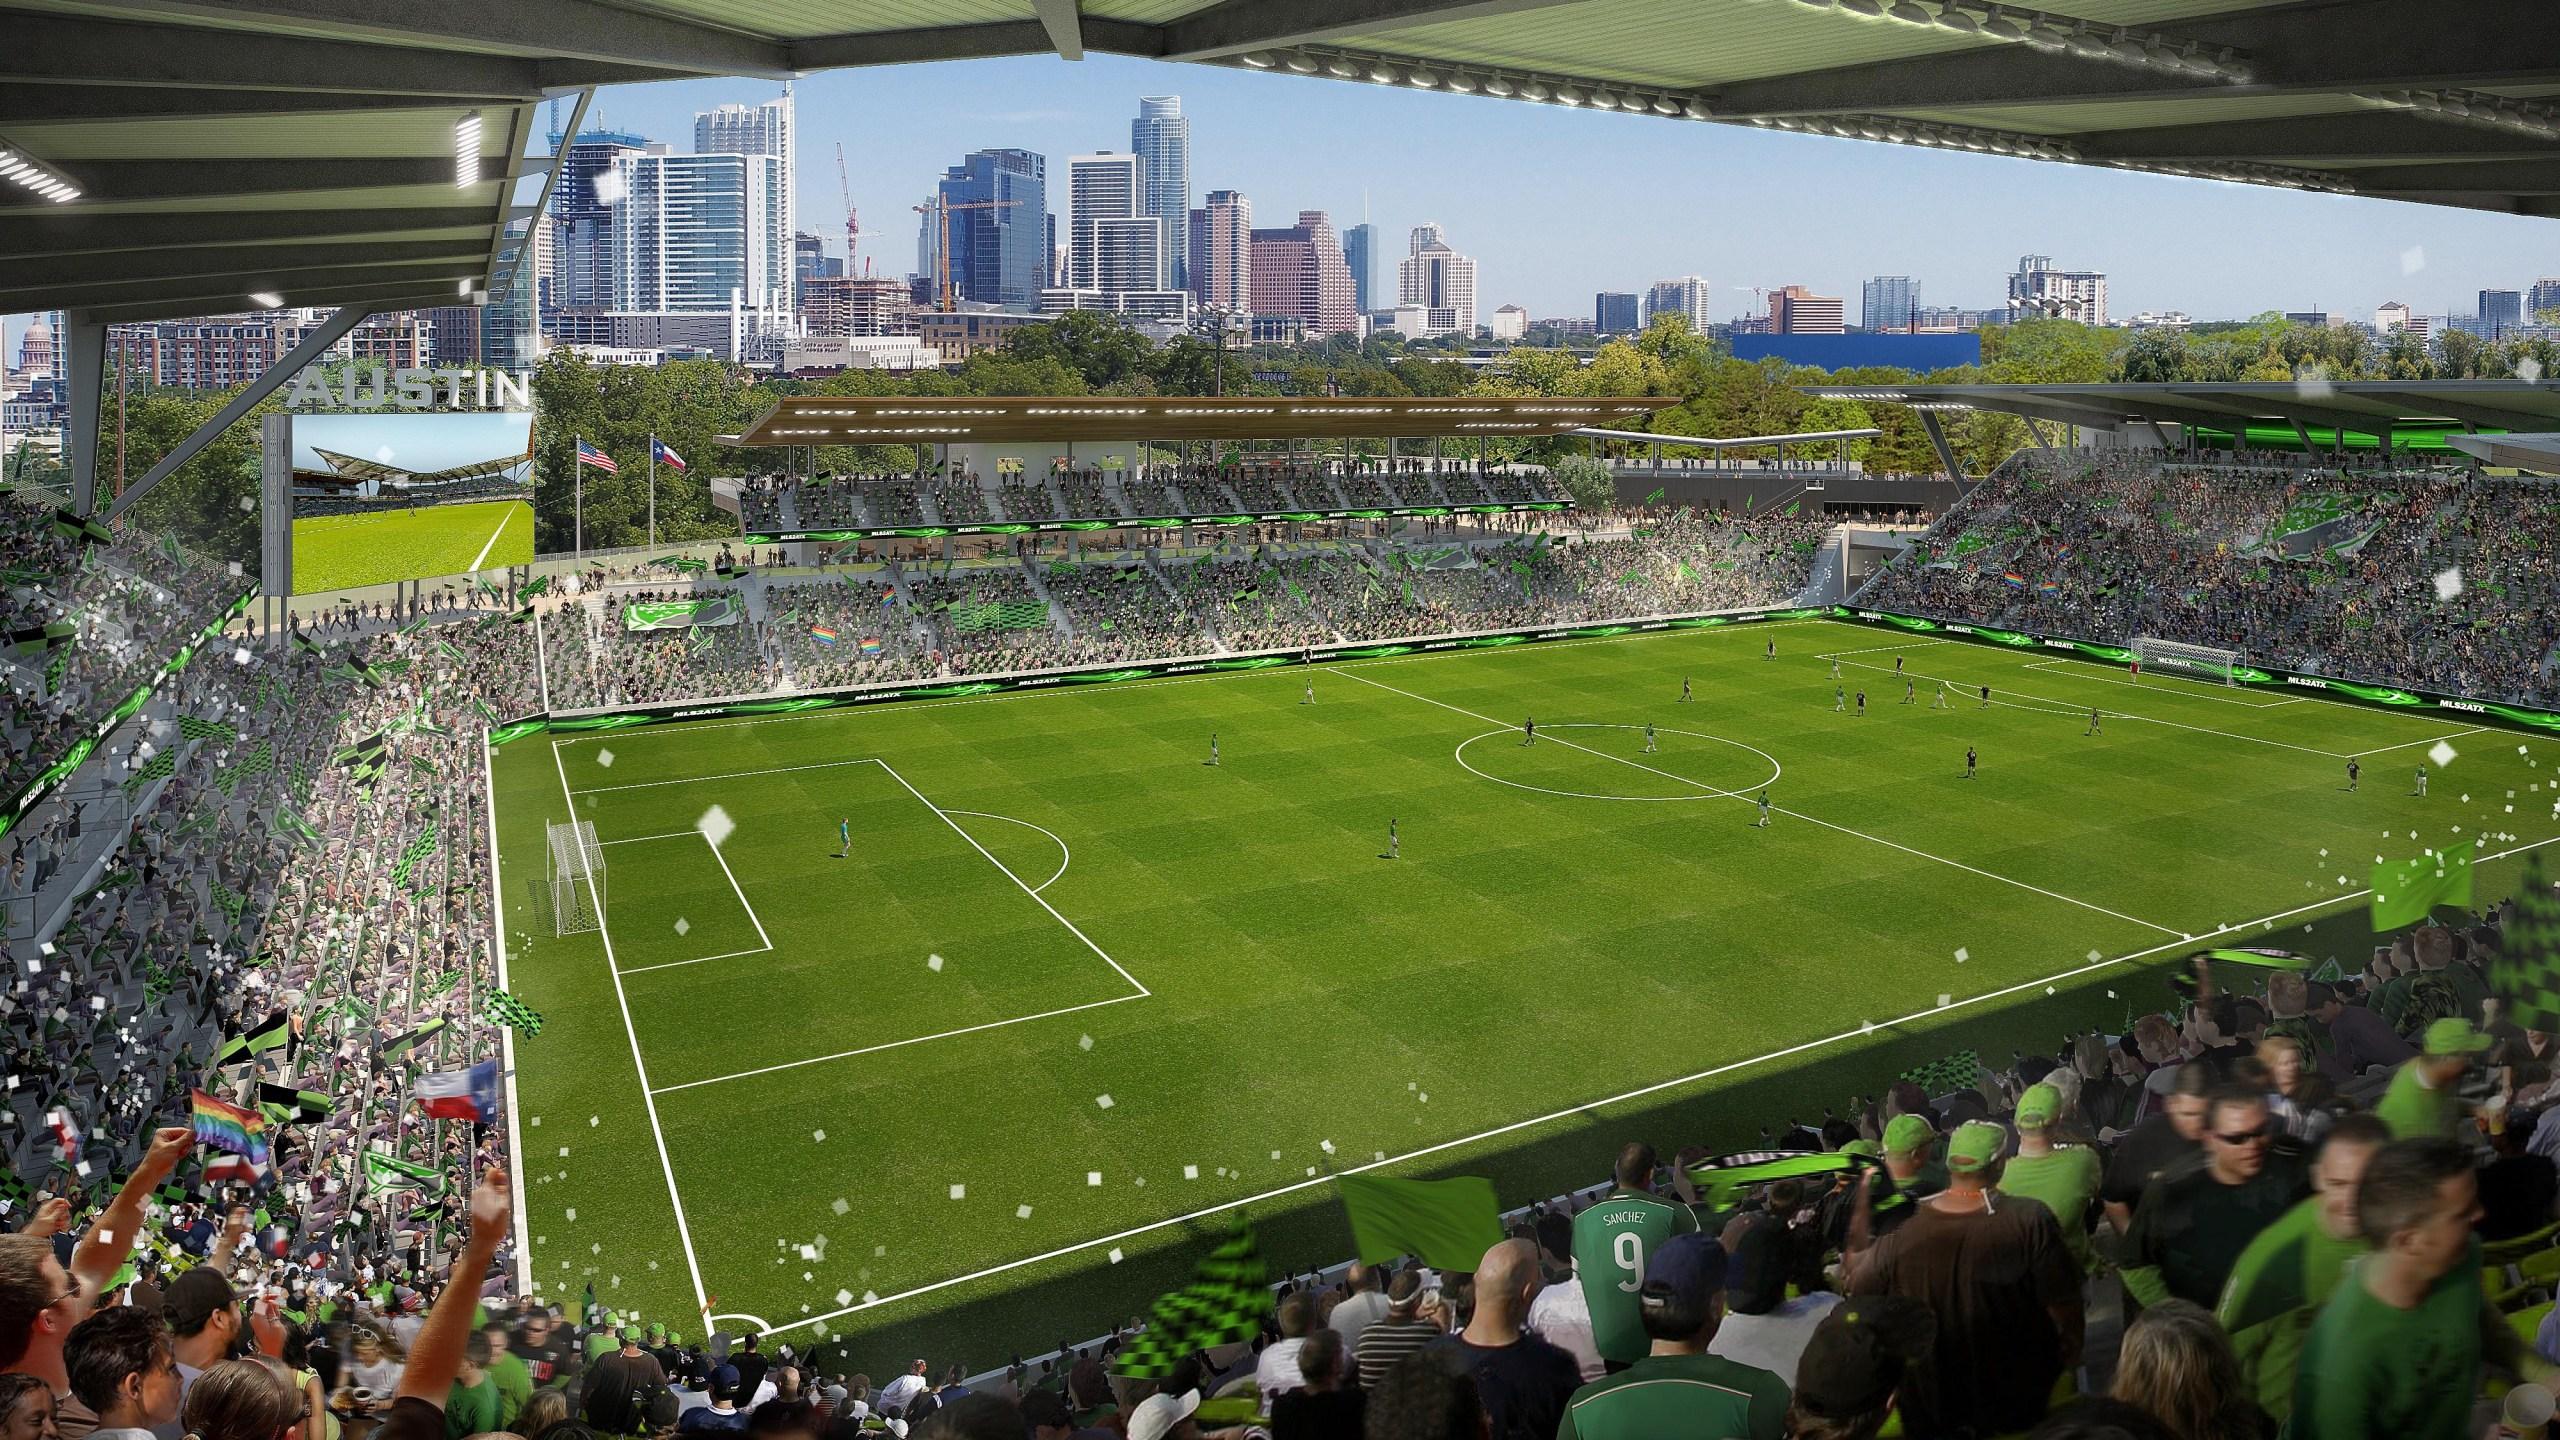 Austin MLS Soccer stadium_593825